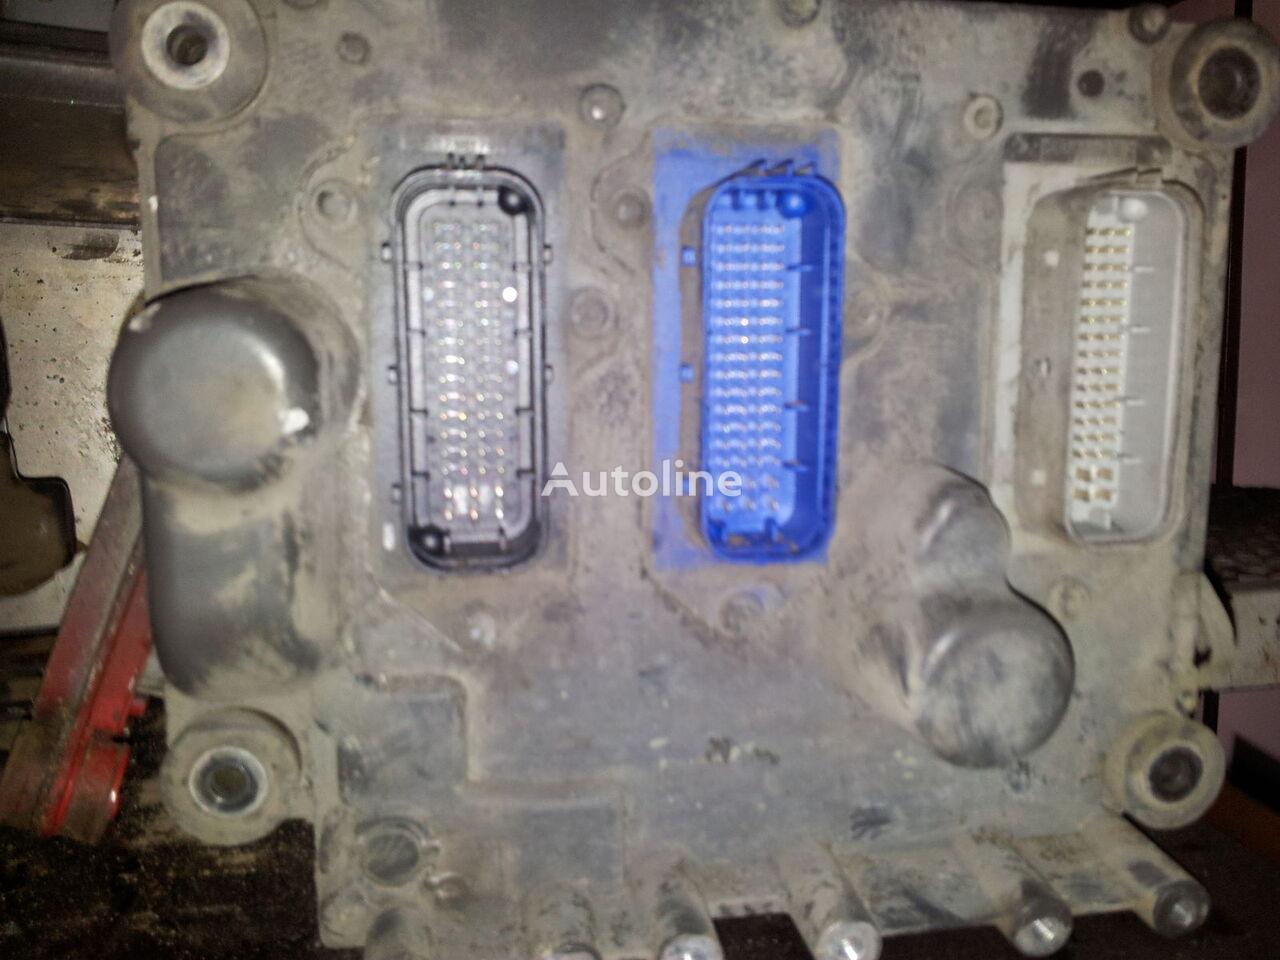 блок управления  DAF 105XF EURO5 electronic control unit ECU EDC engine managment, engine control unit, DMCI 1679021; 1684367, 1664539, 1679021, 1684367, 1887331 для тягача DAF 105XF